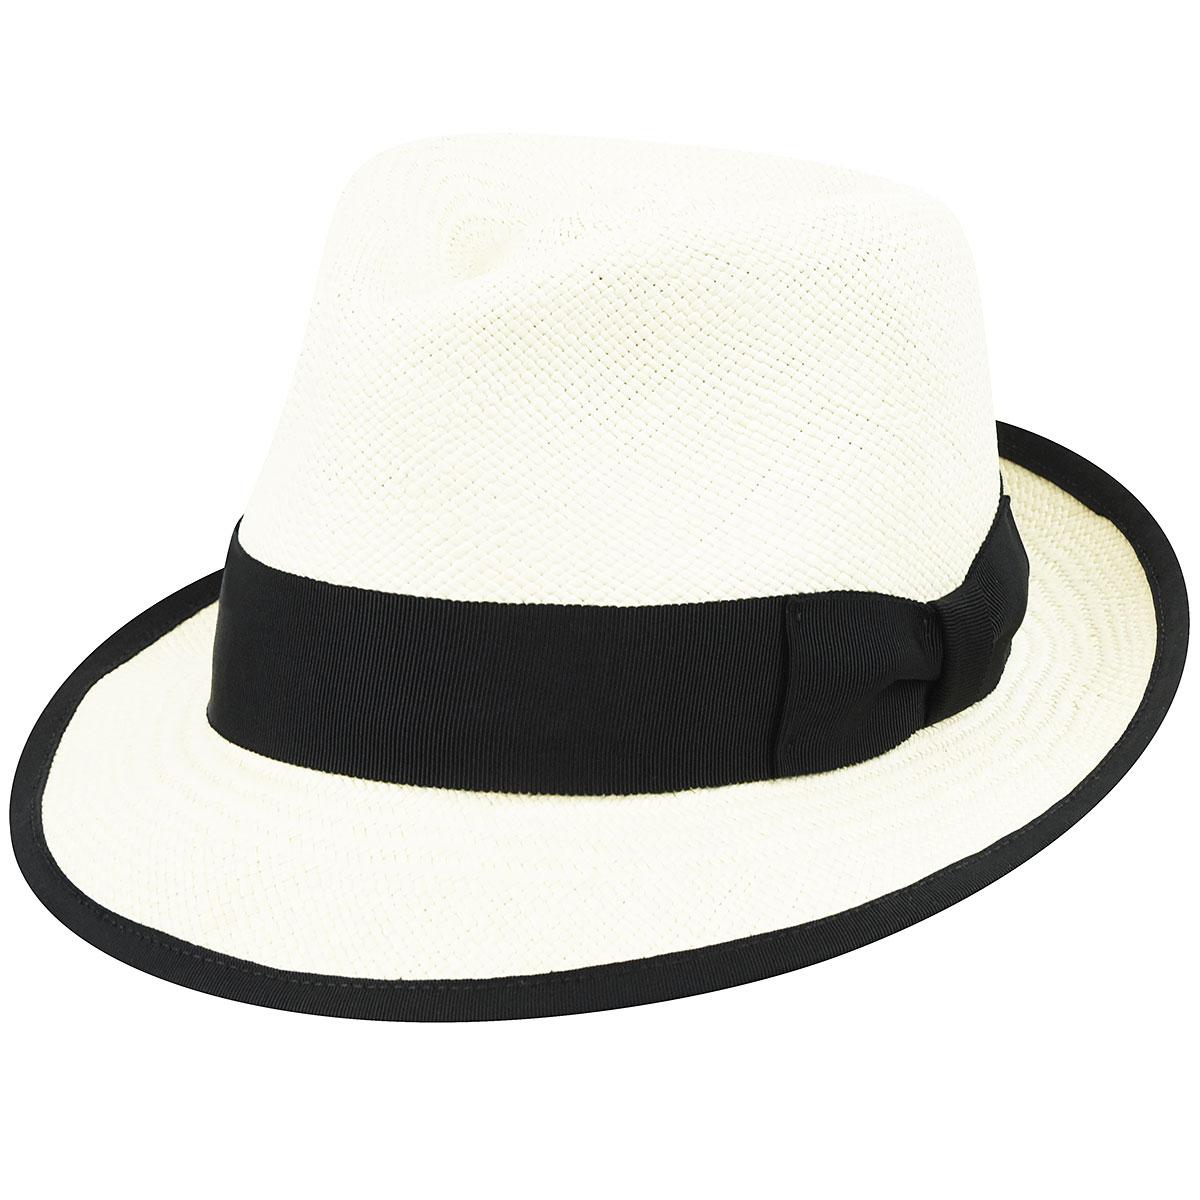 1920s Mens Hats & Caps | Gatsby, Peaky Blinders, Gangster Riviera Panama $78.00 AT vintagedancer.com